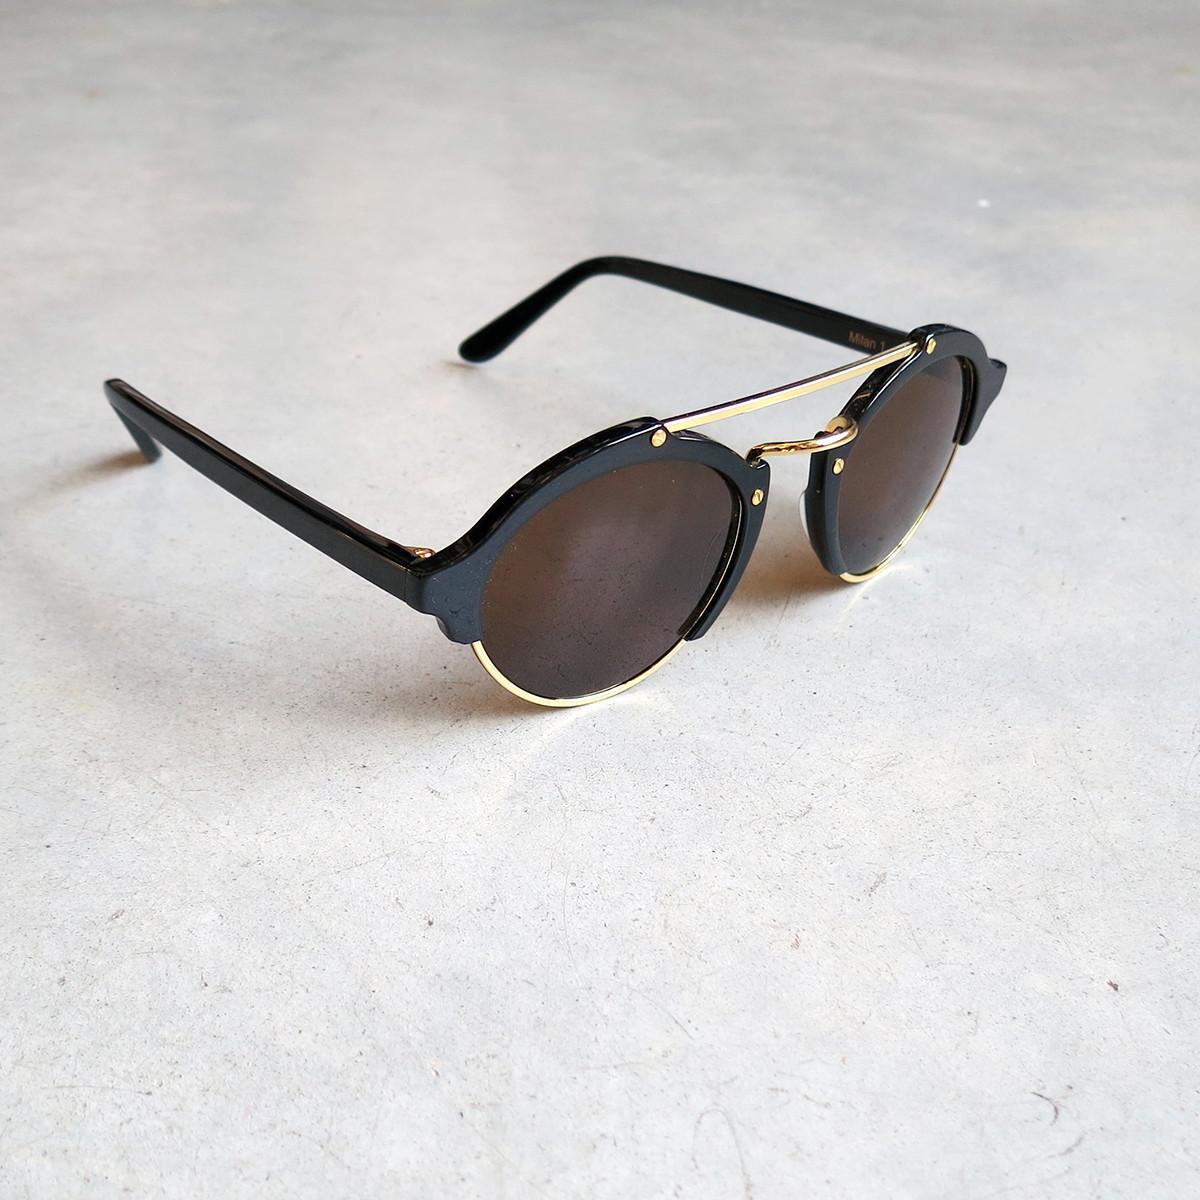 Illesteva Milan Sunglasses In Black With Brown Lens Garmentory